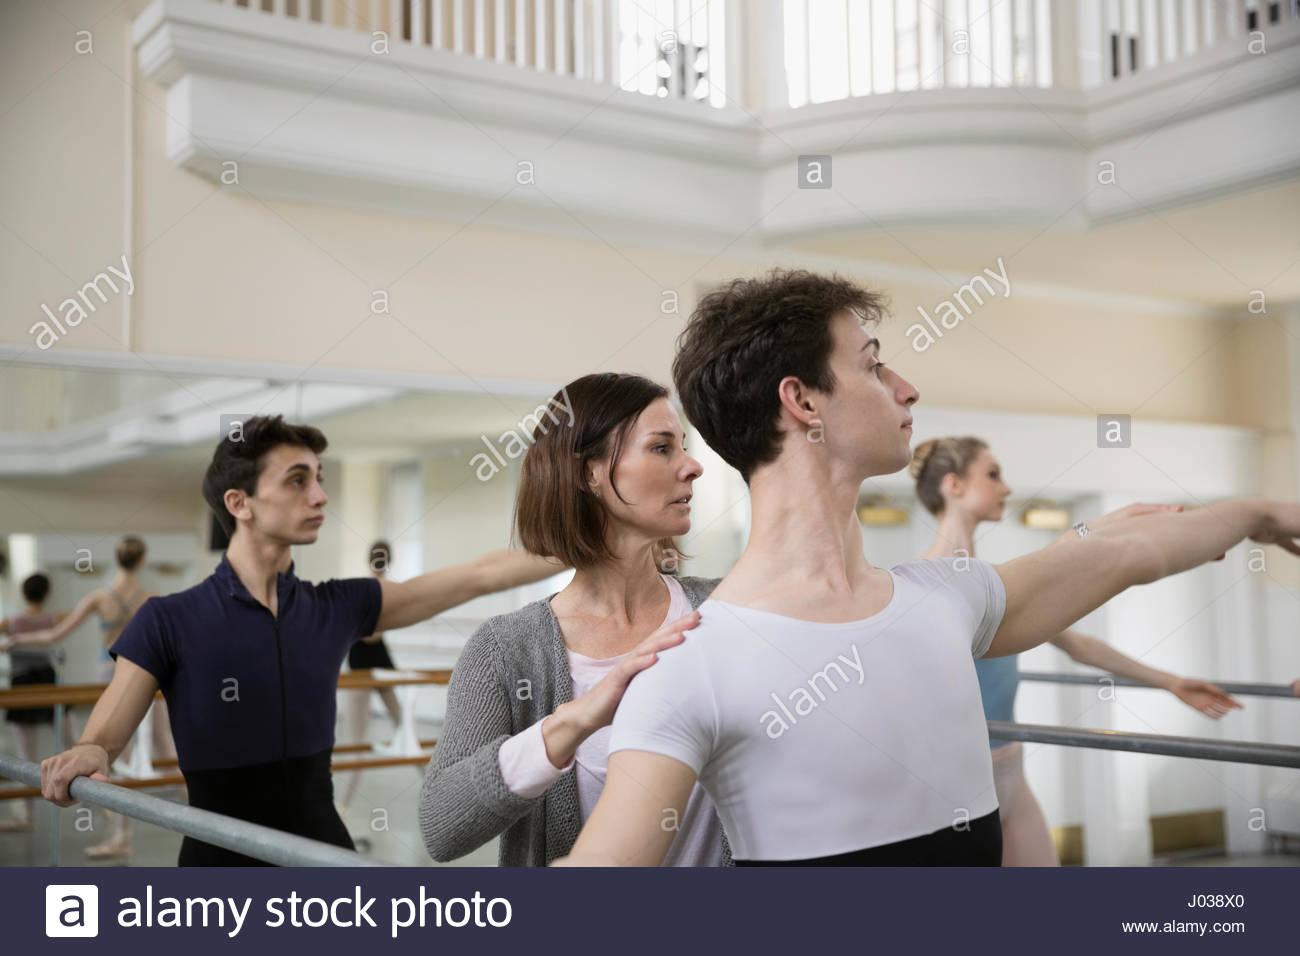 Instructor adjusting arms of male ballet dancer practicing in dance studio - Stock Image